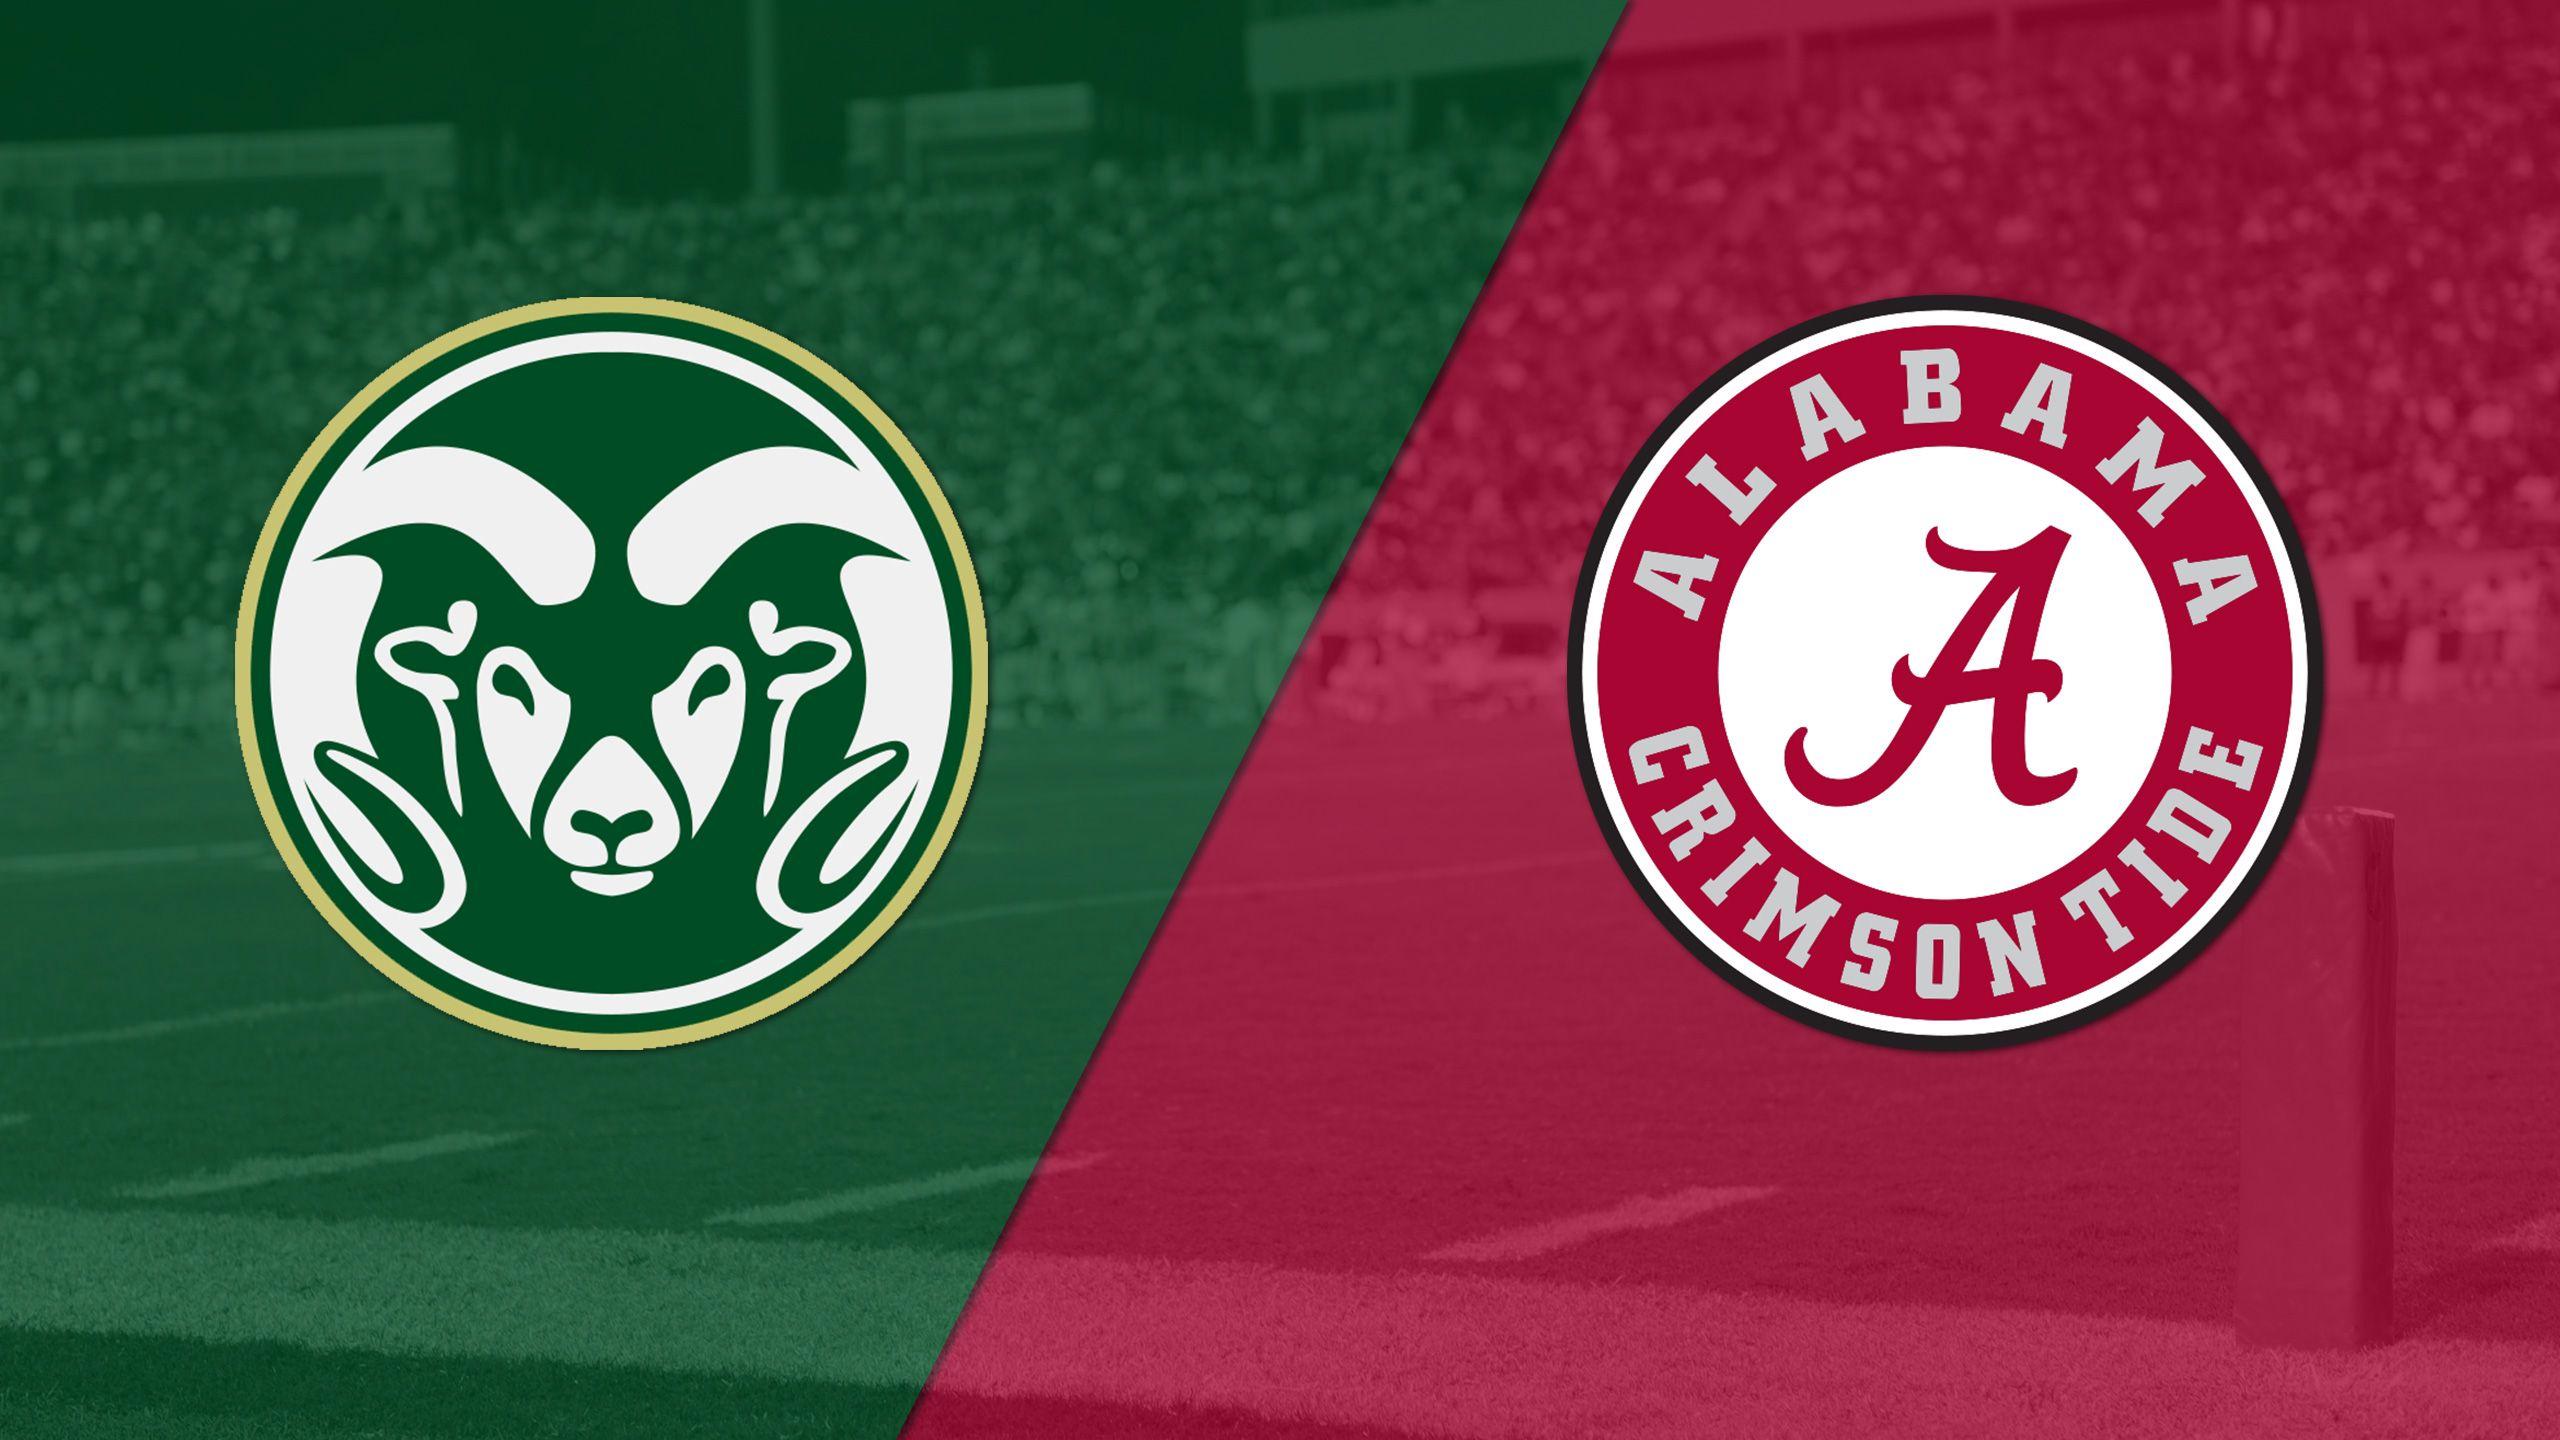 Colorado State vs. #1 Alabama (Football) (re-air)